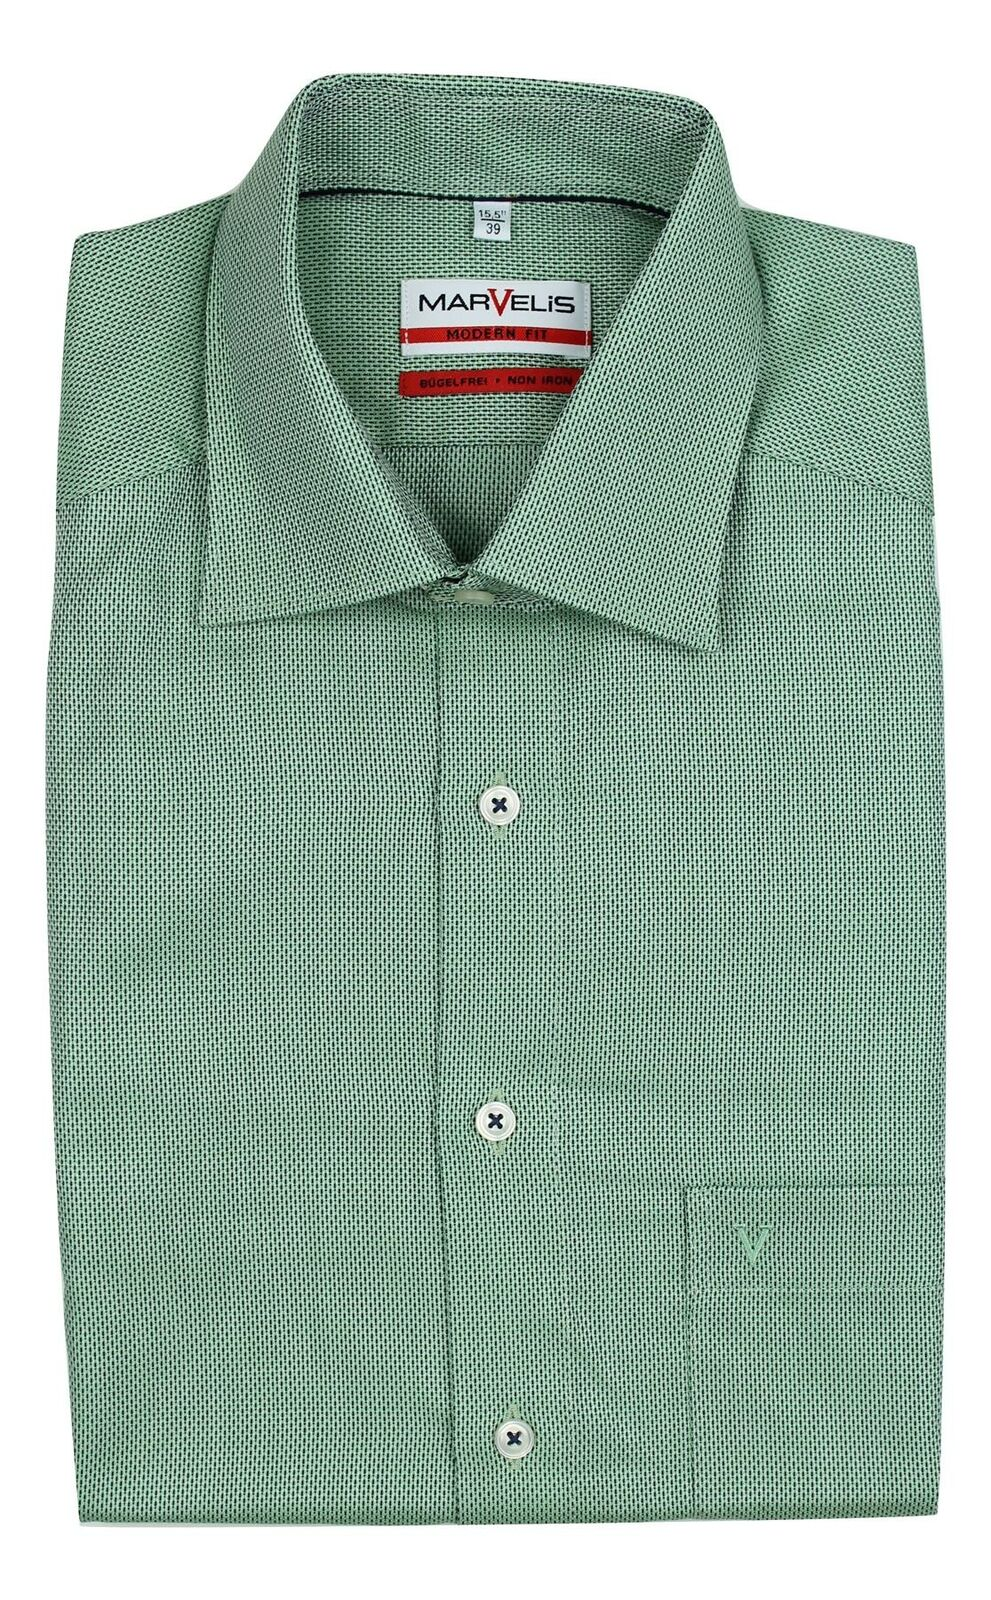 Green Mix Textured Spread Collar